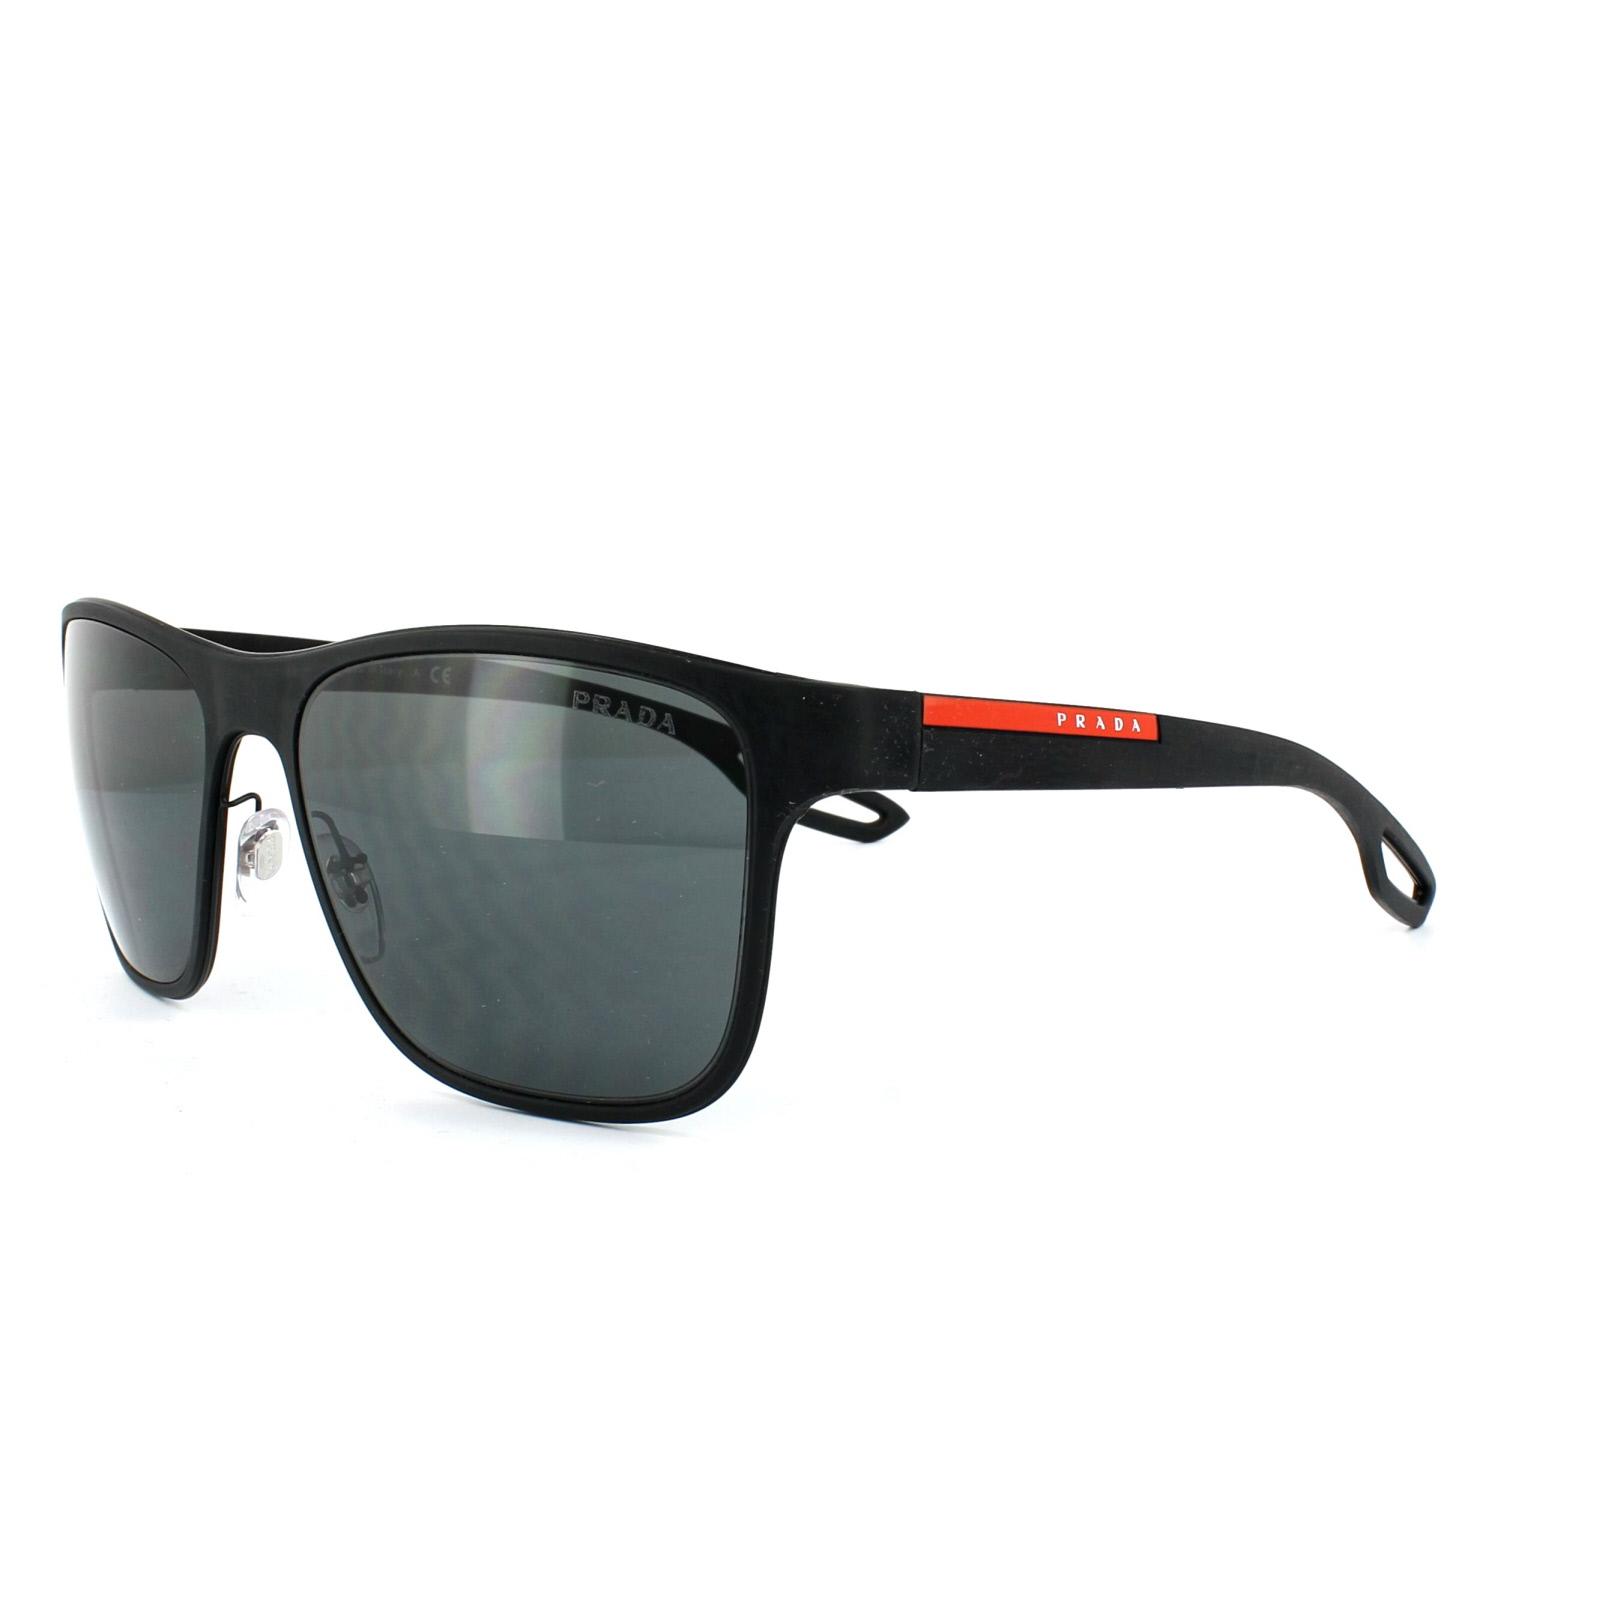 prada sport sonnenbrille 56qs dg01a1 black rubber dark. Black Bedroom Furniture Sets. Home Design Ideas